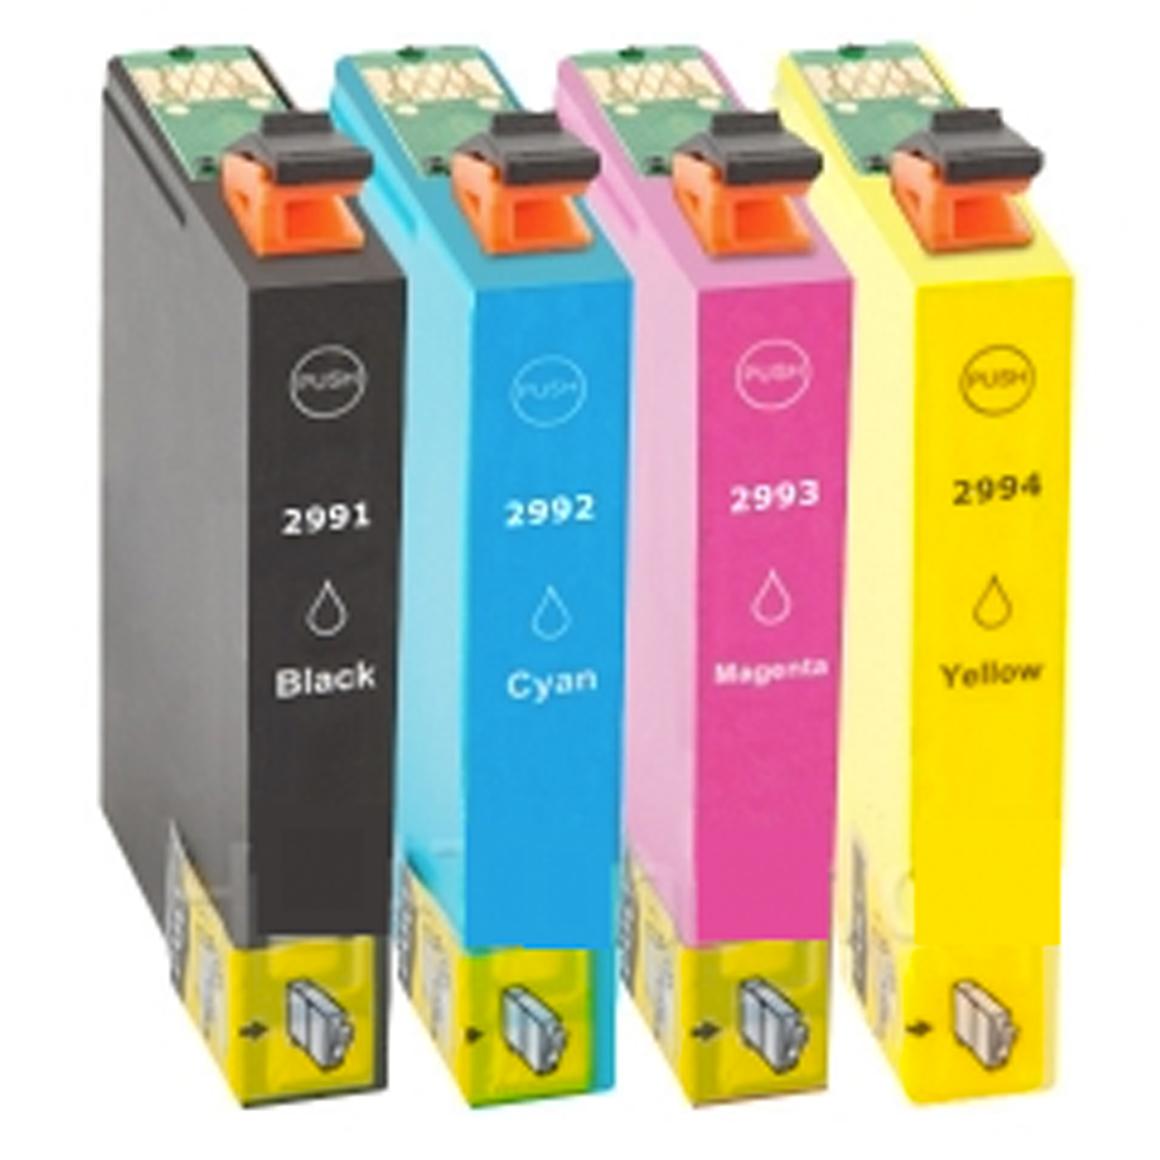 Afbeelding van Epson Expression Home XP 257 inkt cartridge Multipack 29 Xl T2996 (huismerk inktcartridges)